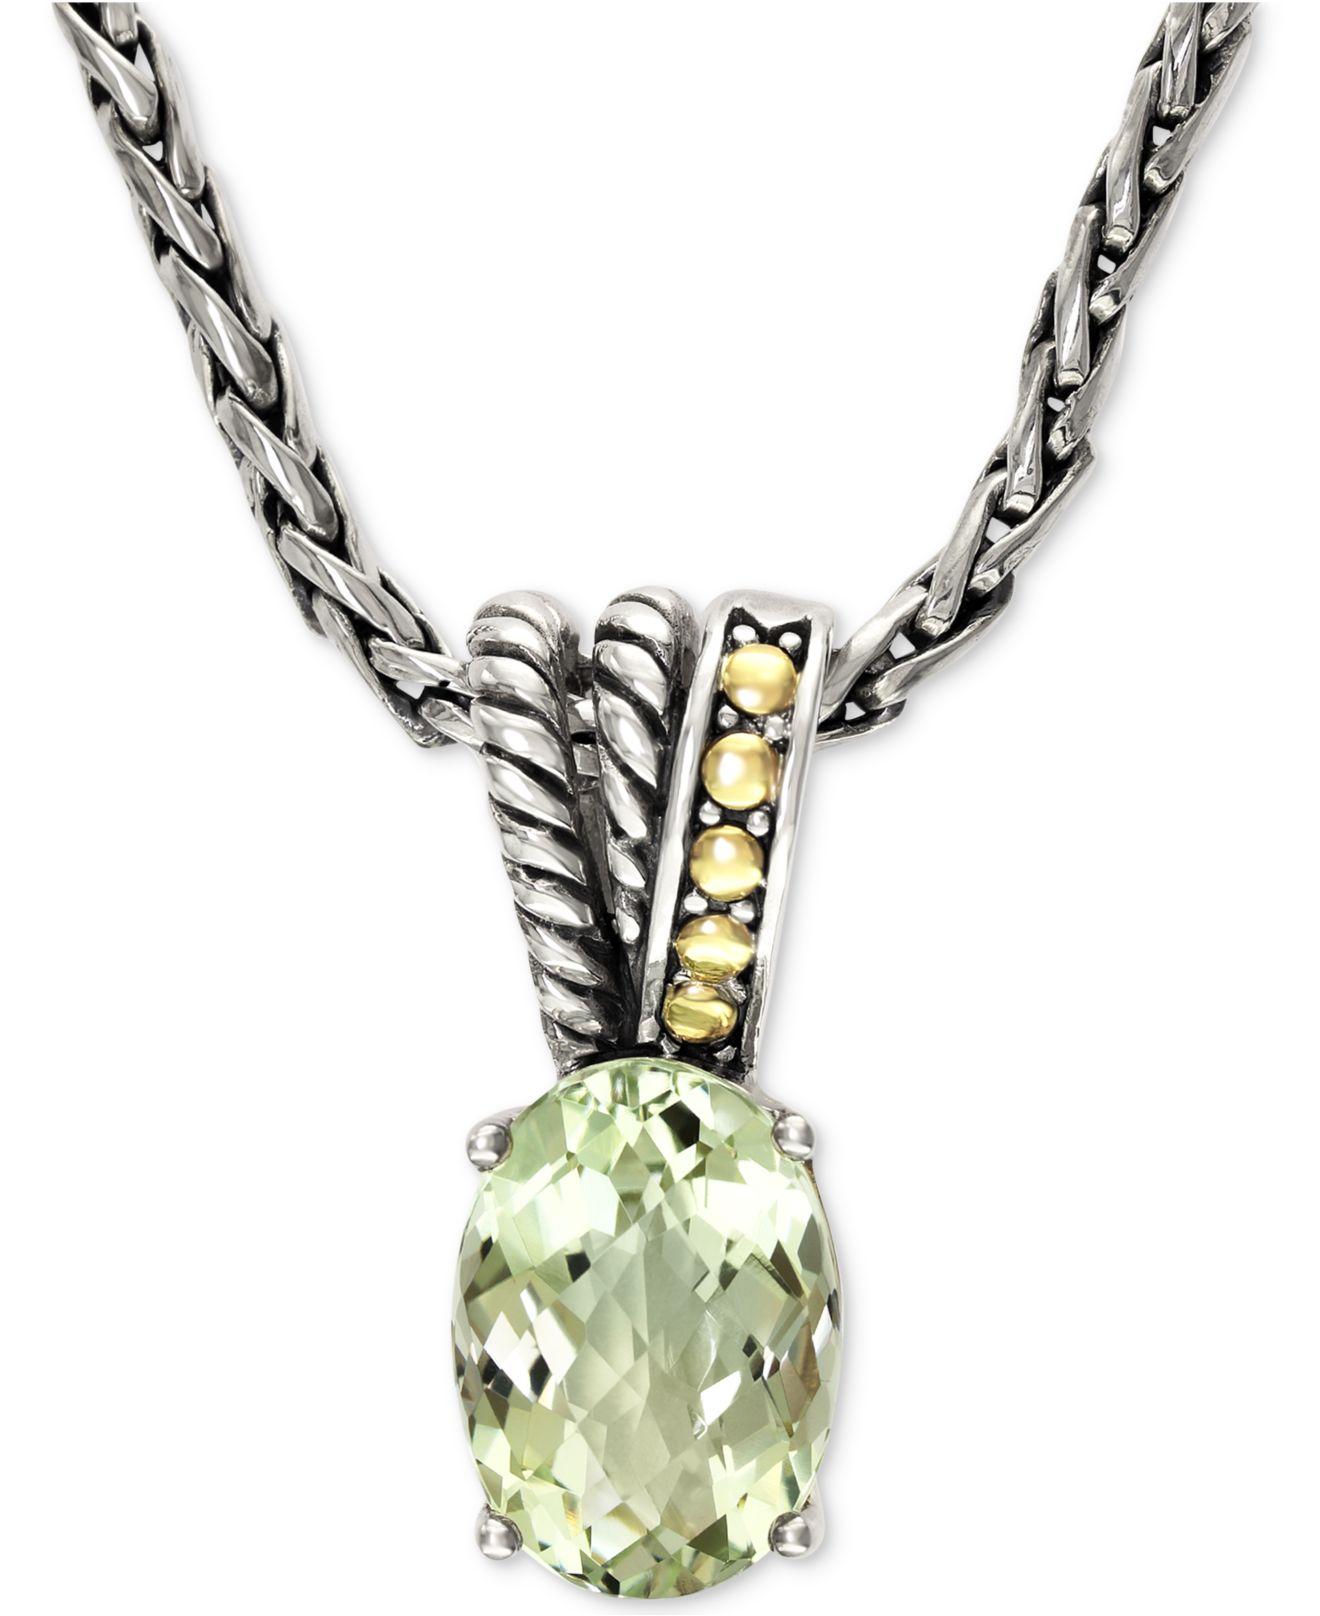 Lyst Effy Collection Effy Green Amethyst Pendant